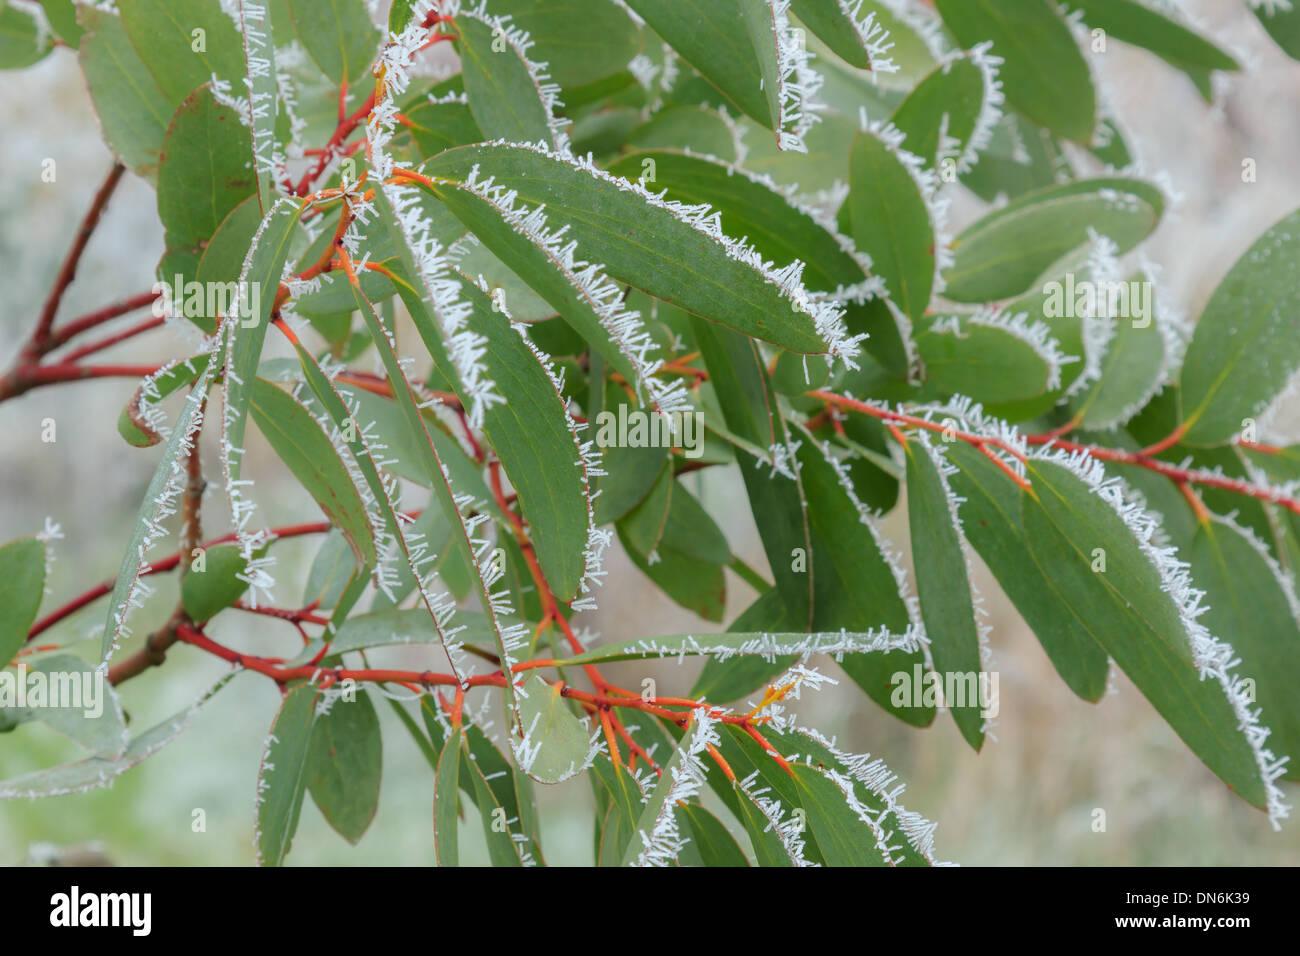 Frost on leaves of Eucalyptus niphophila (= Eucalyptus pauciflora ssp. niphophila) // givre sur feuilles d'Eucalyptus niphophila - Stock Image